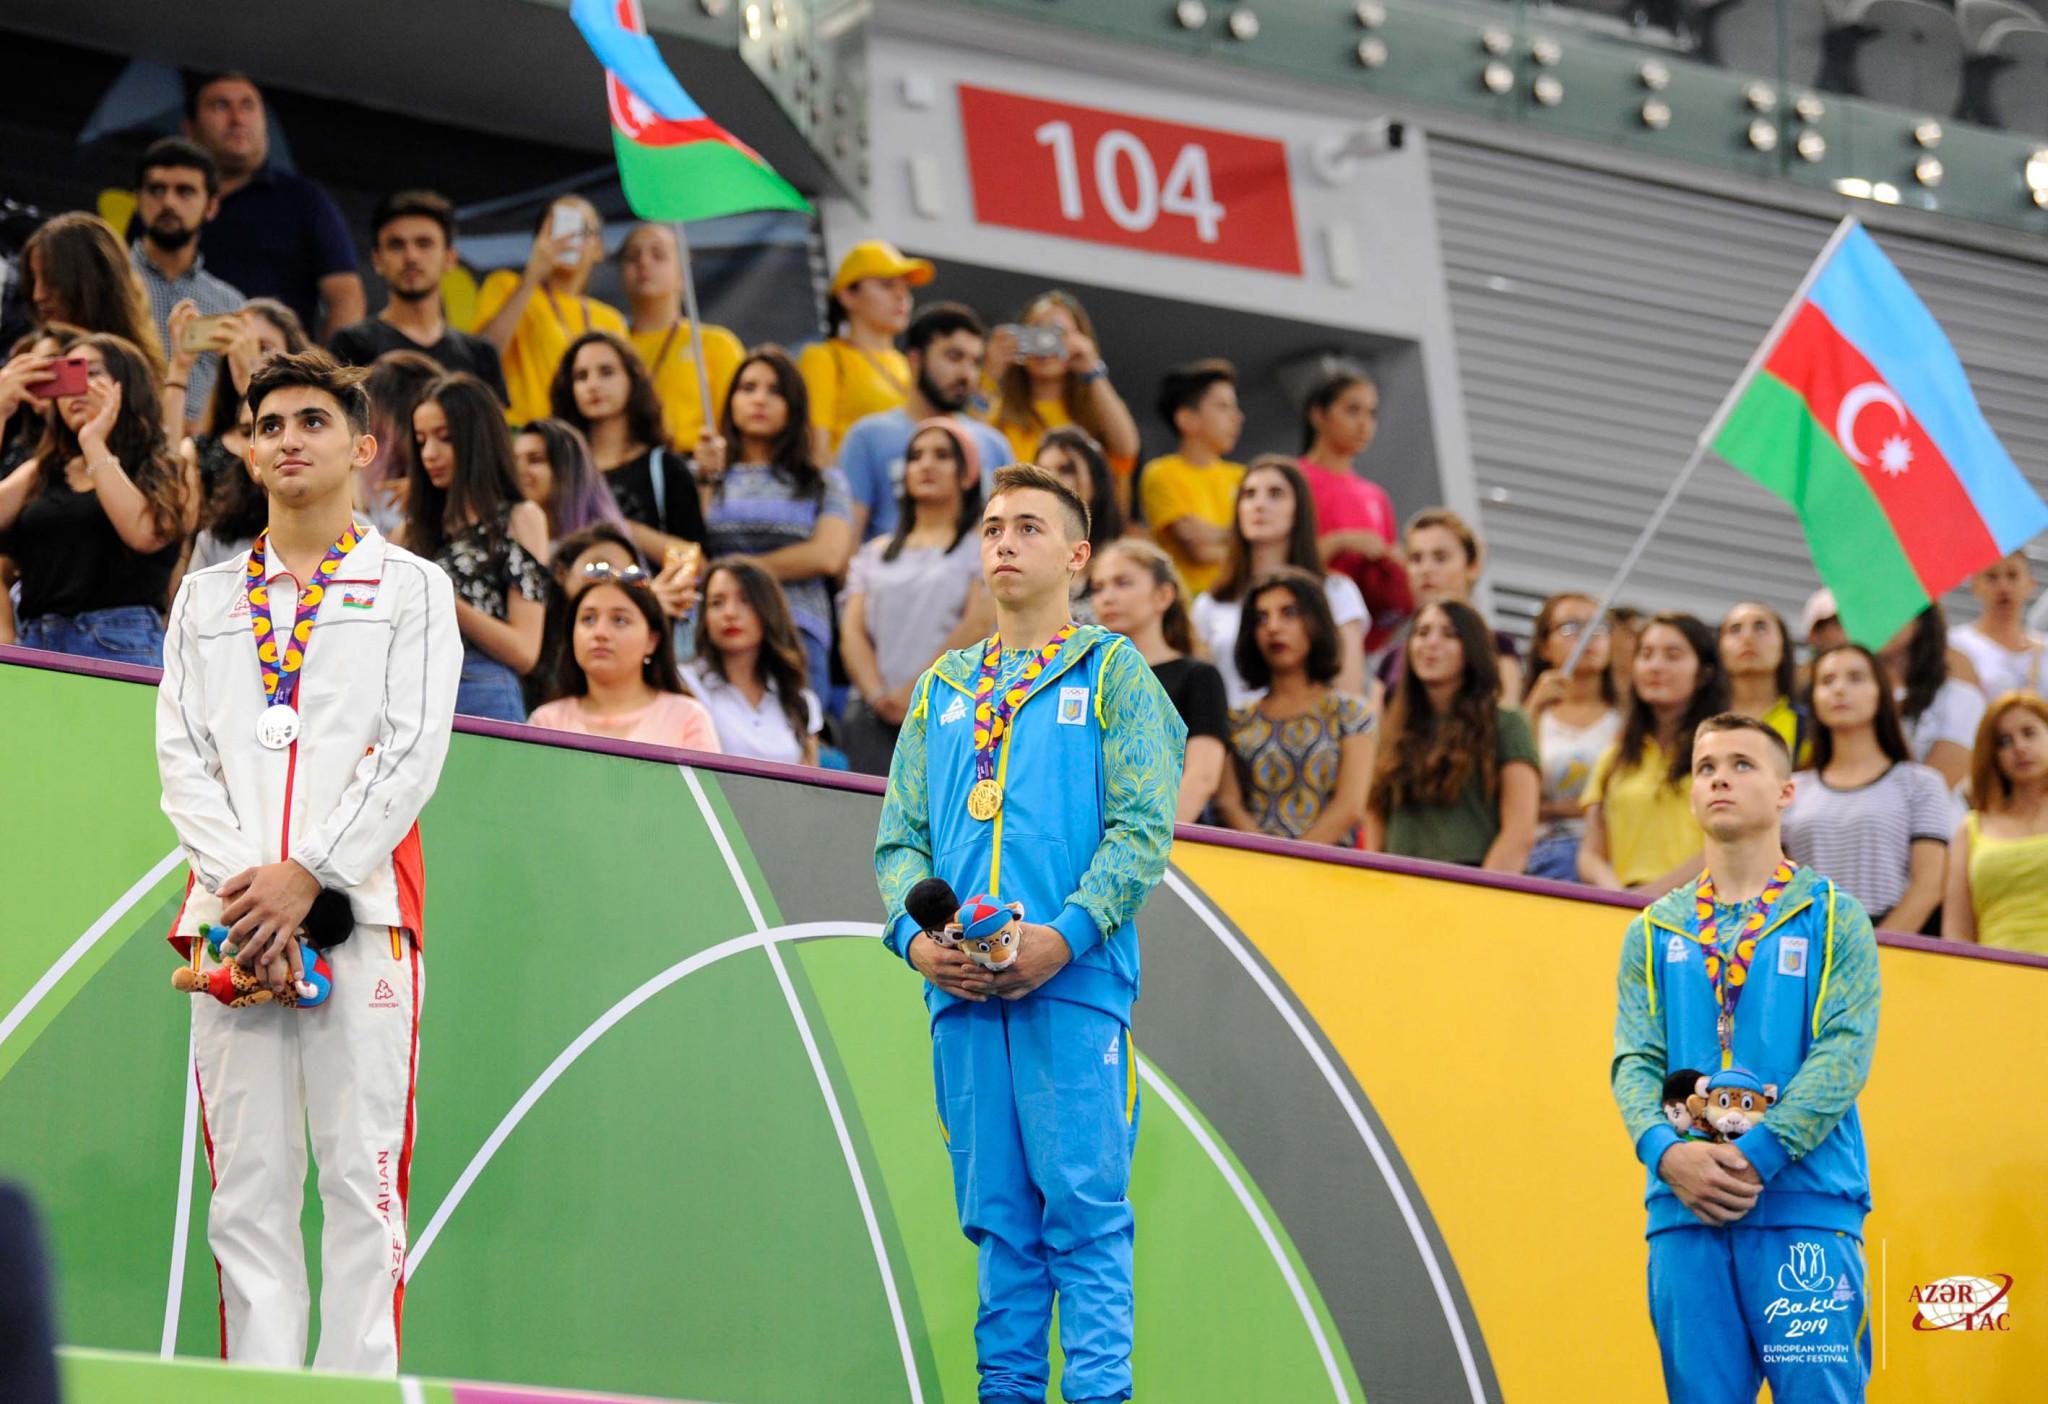 Listunova and Chepurnyi dominate artistic gymnastics apparatus finals at EYOF in Baku